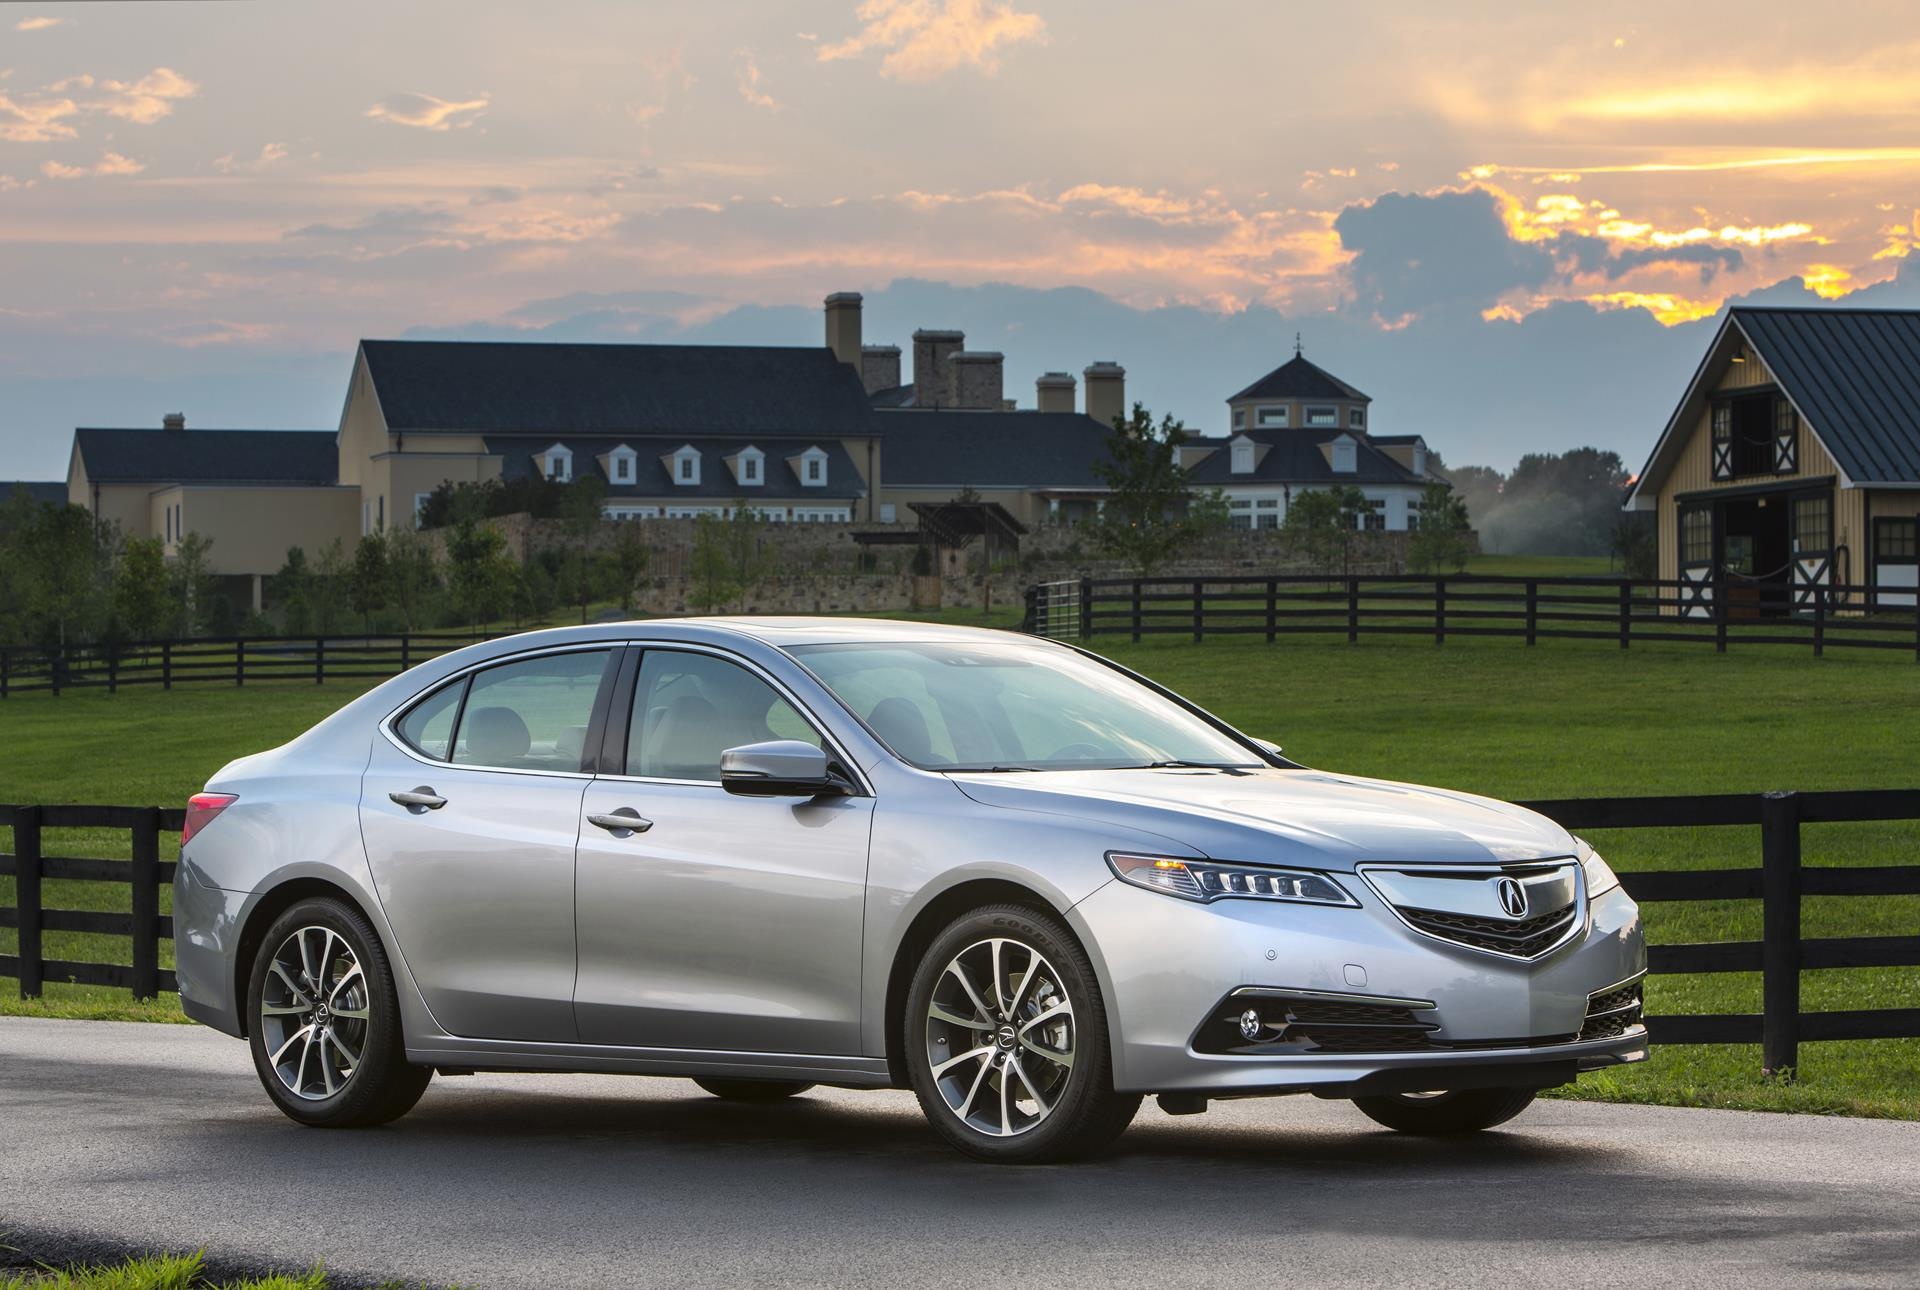 2016 Acura TLX News and Information | conceptcarz.com